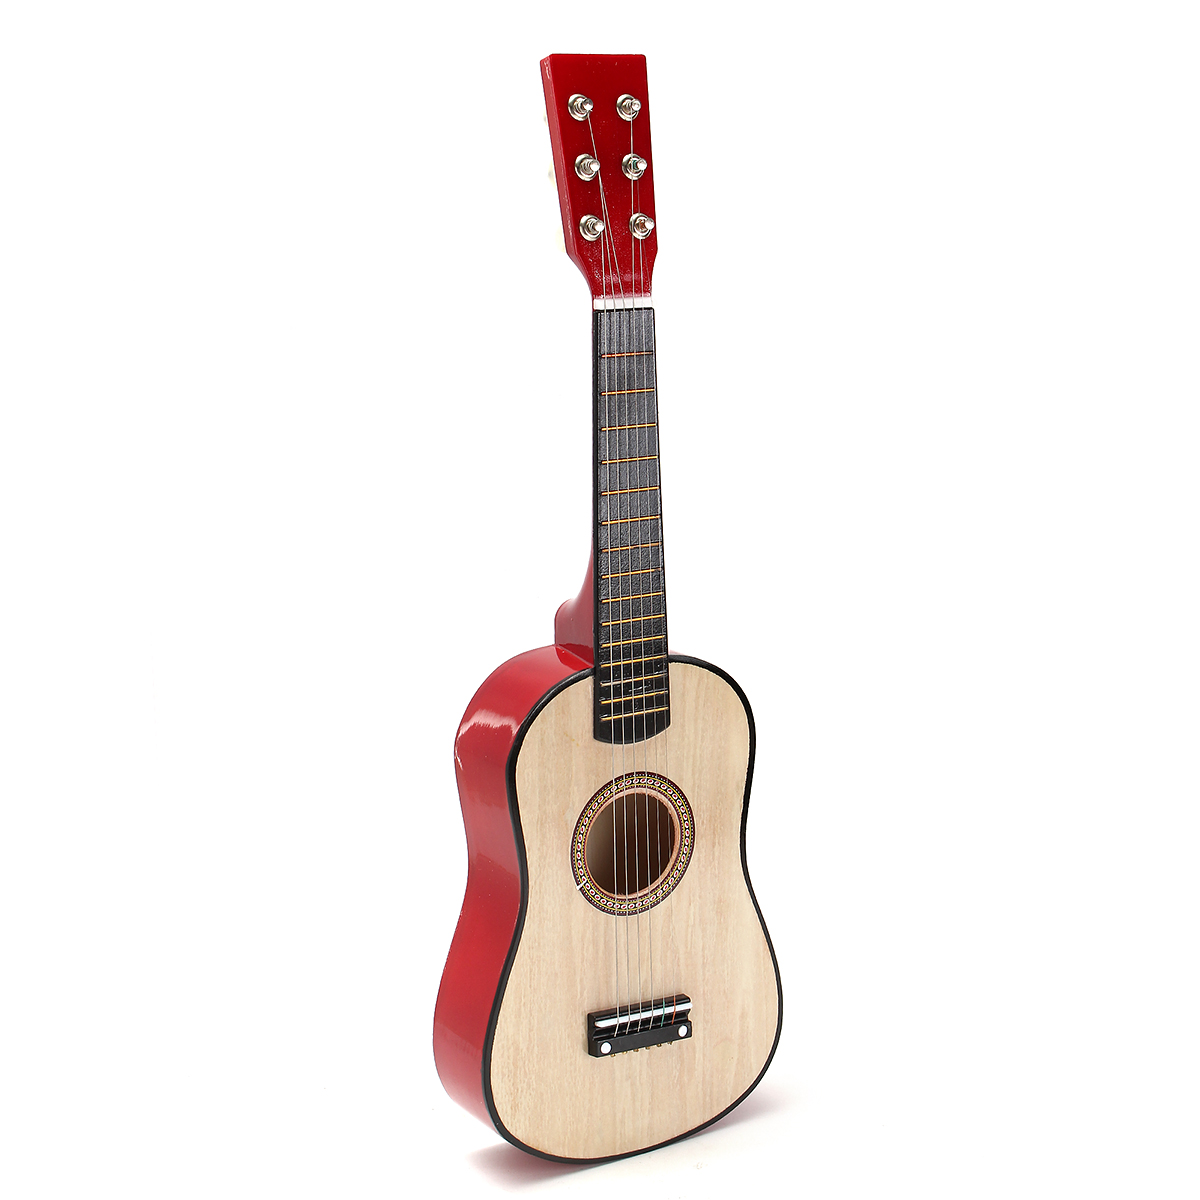 Children Wooden 6 Strings Guitar Musical Instrument Toys for Beginner Purple DOSGO Guitar Kids For 3 4 5 6 Year Old